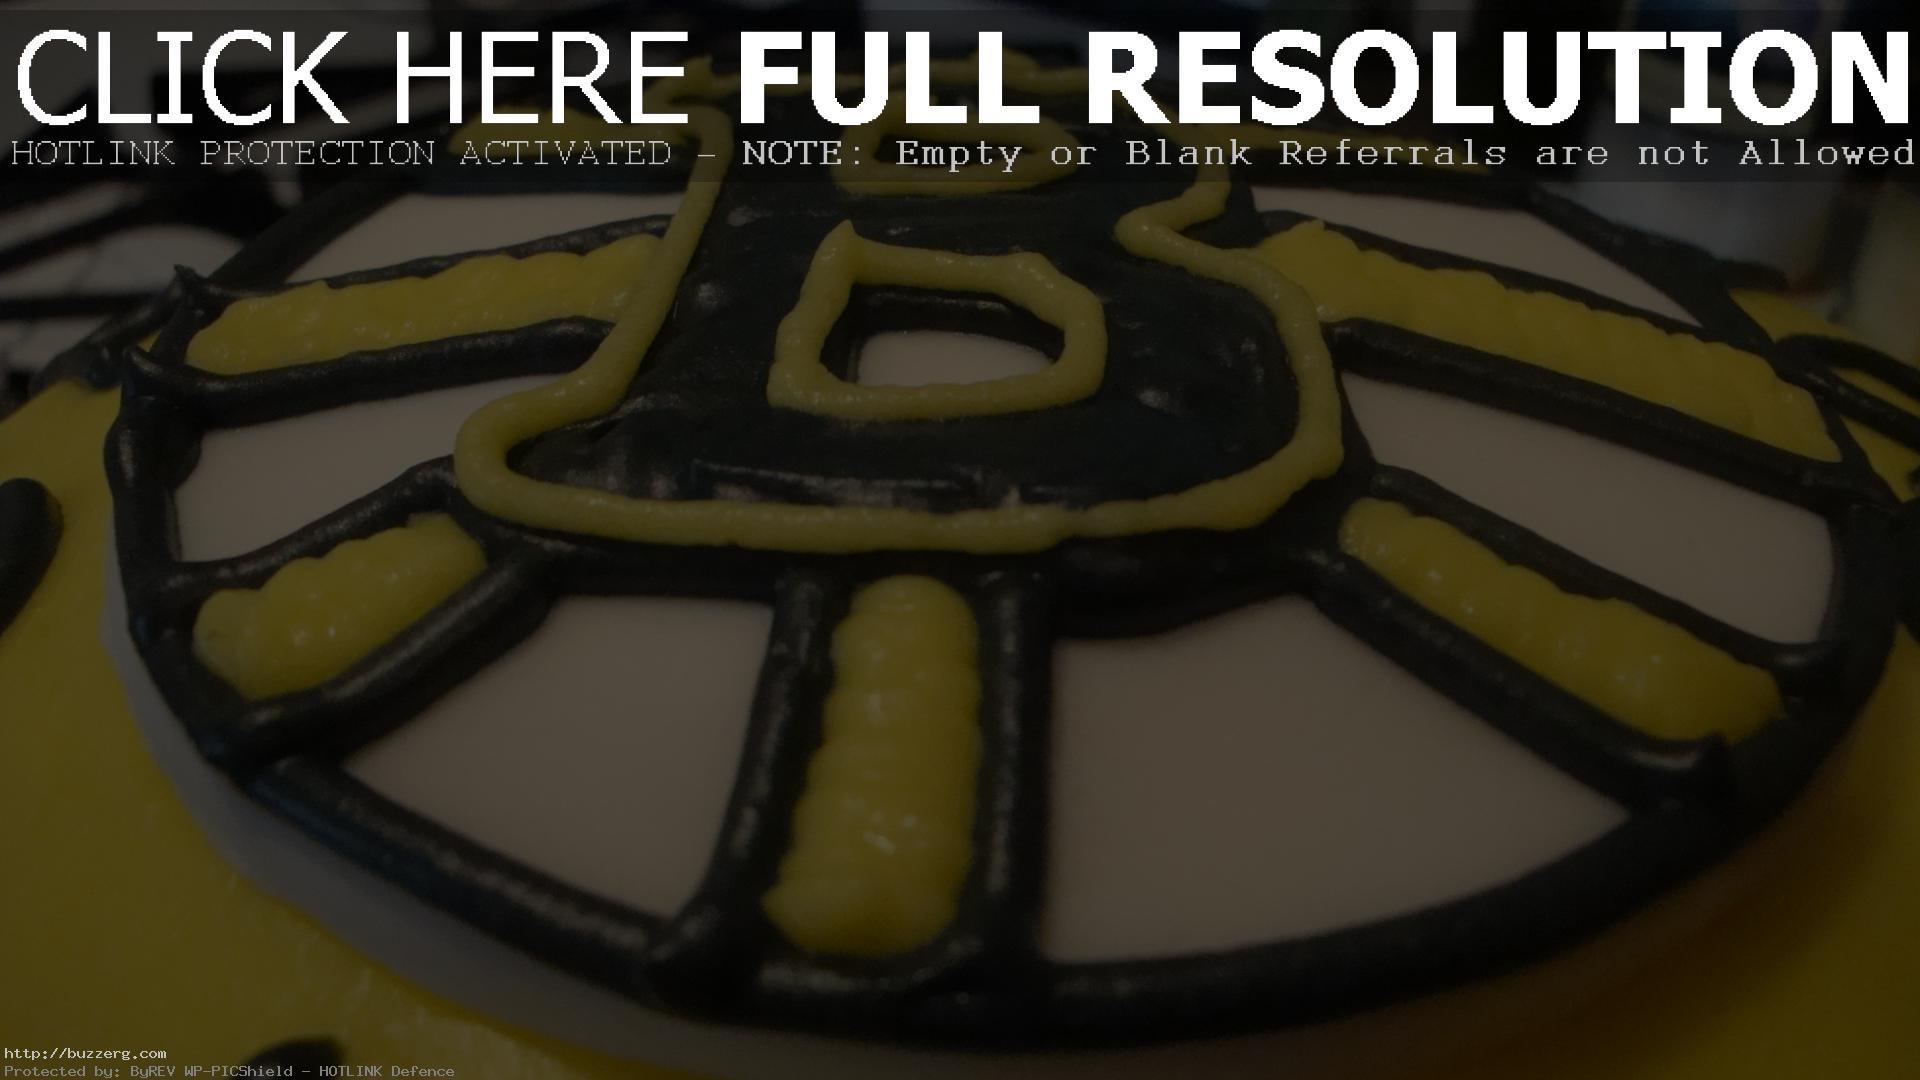 Boston Bruins Birthday Cake (id: 90065)